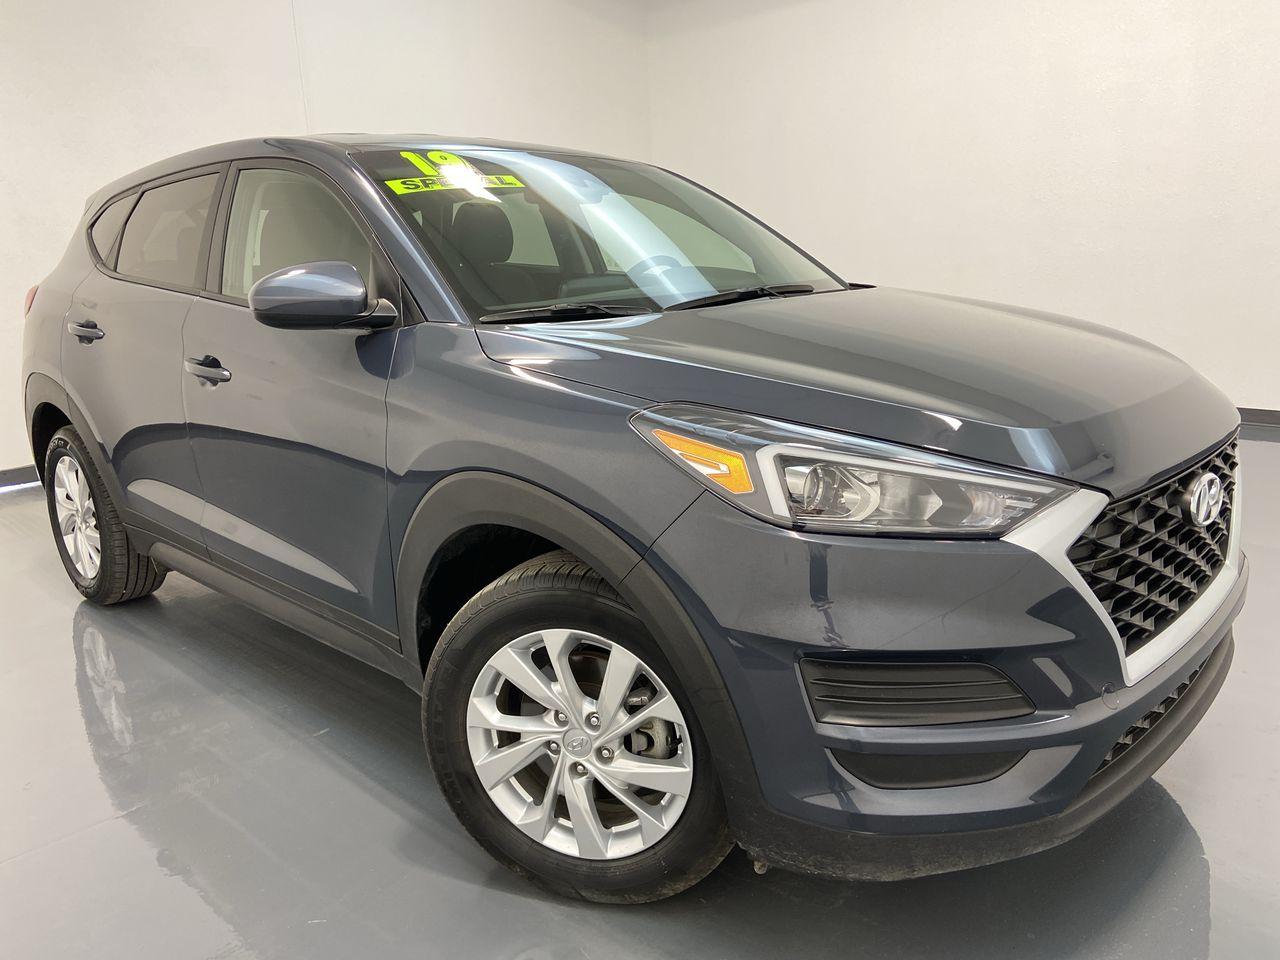 2019 Hyundai Tucson 4D SUV FWD  - 16392  - C & S Car Company